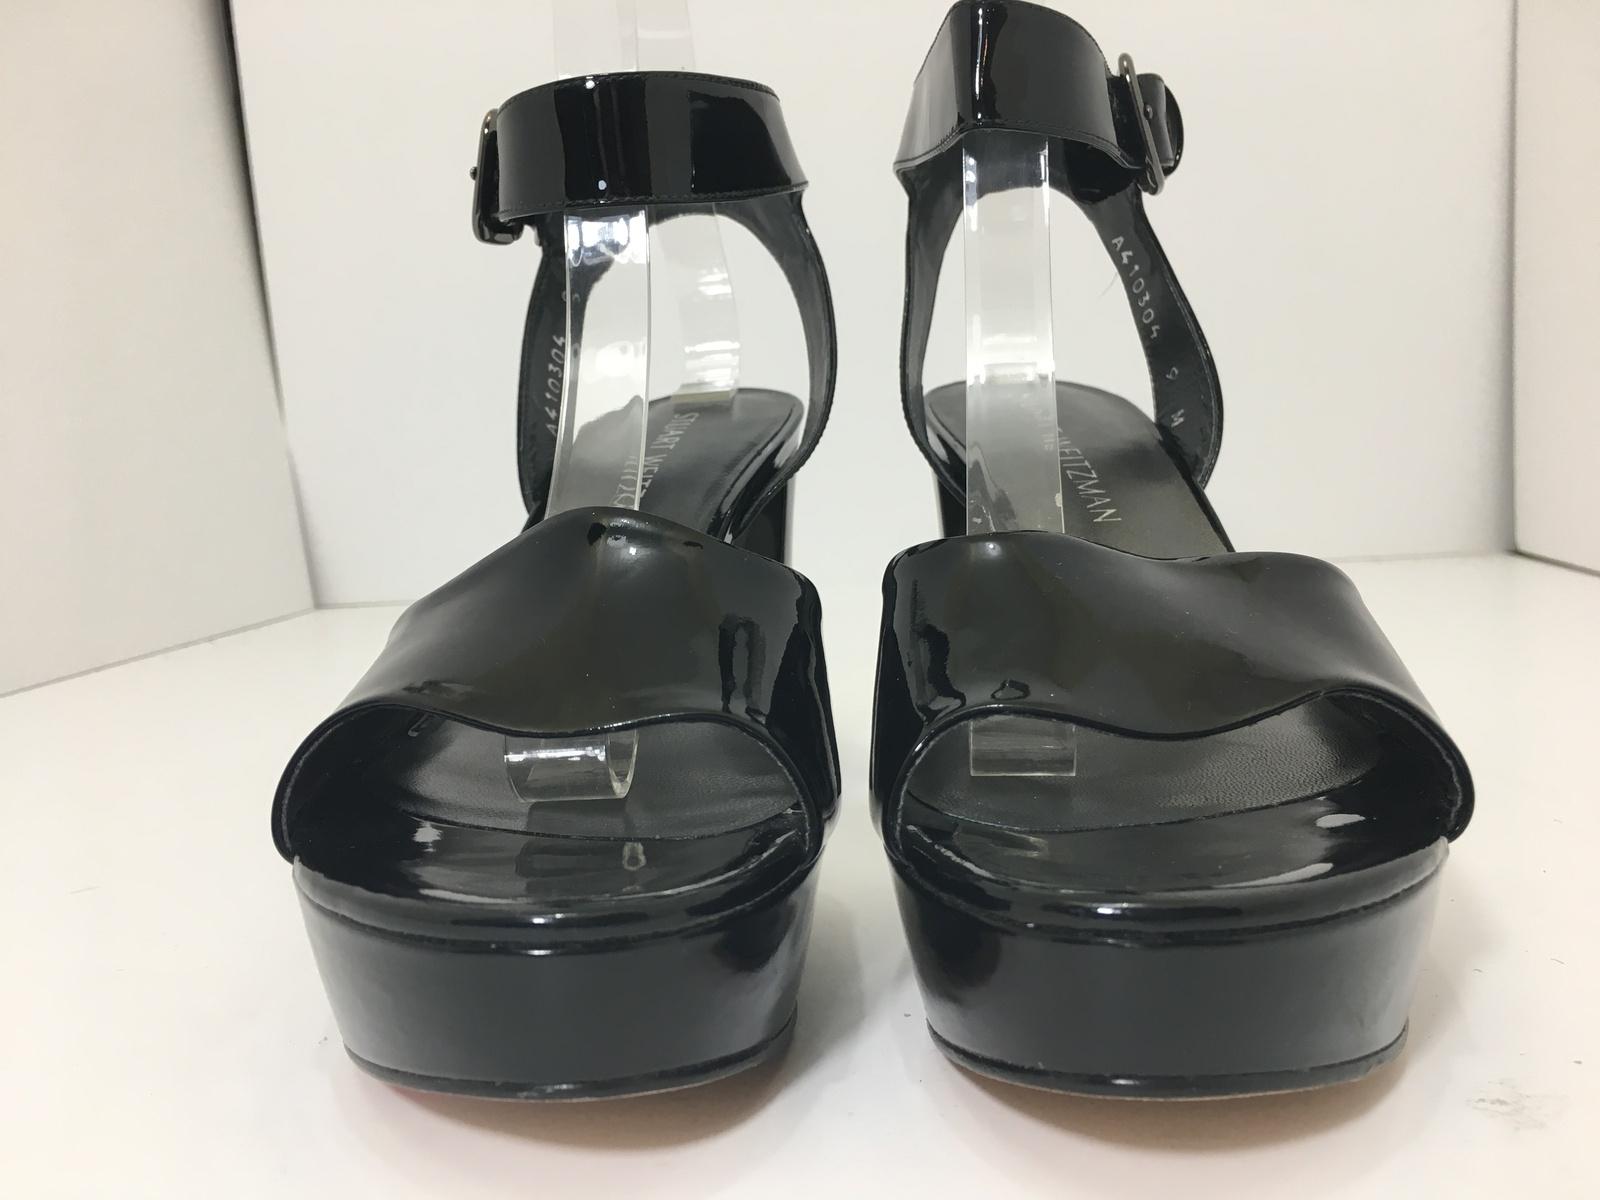 Stuart Weitzman Realdeal Black Patent Women's Platform High Heels Sandals 9 M